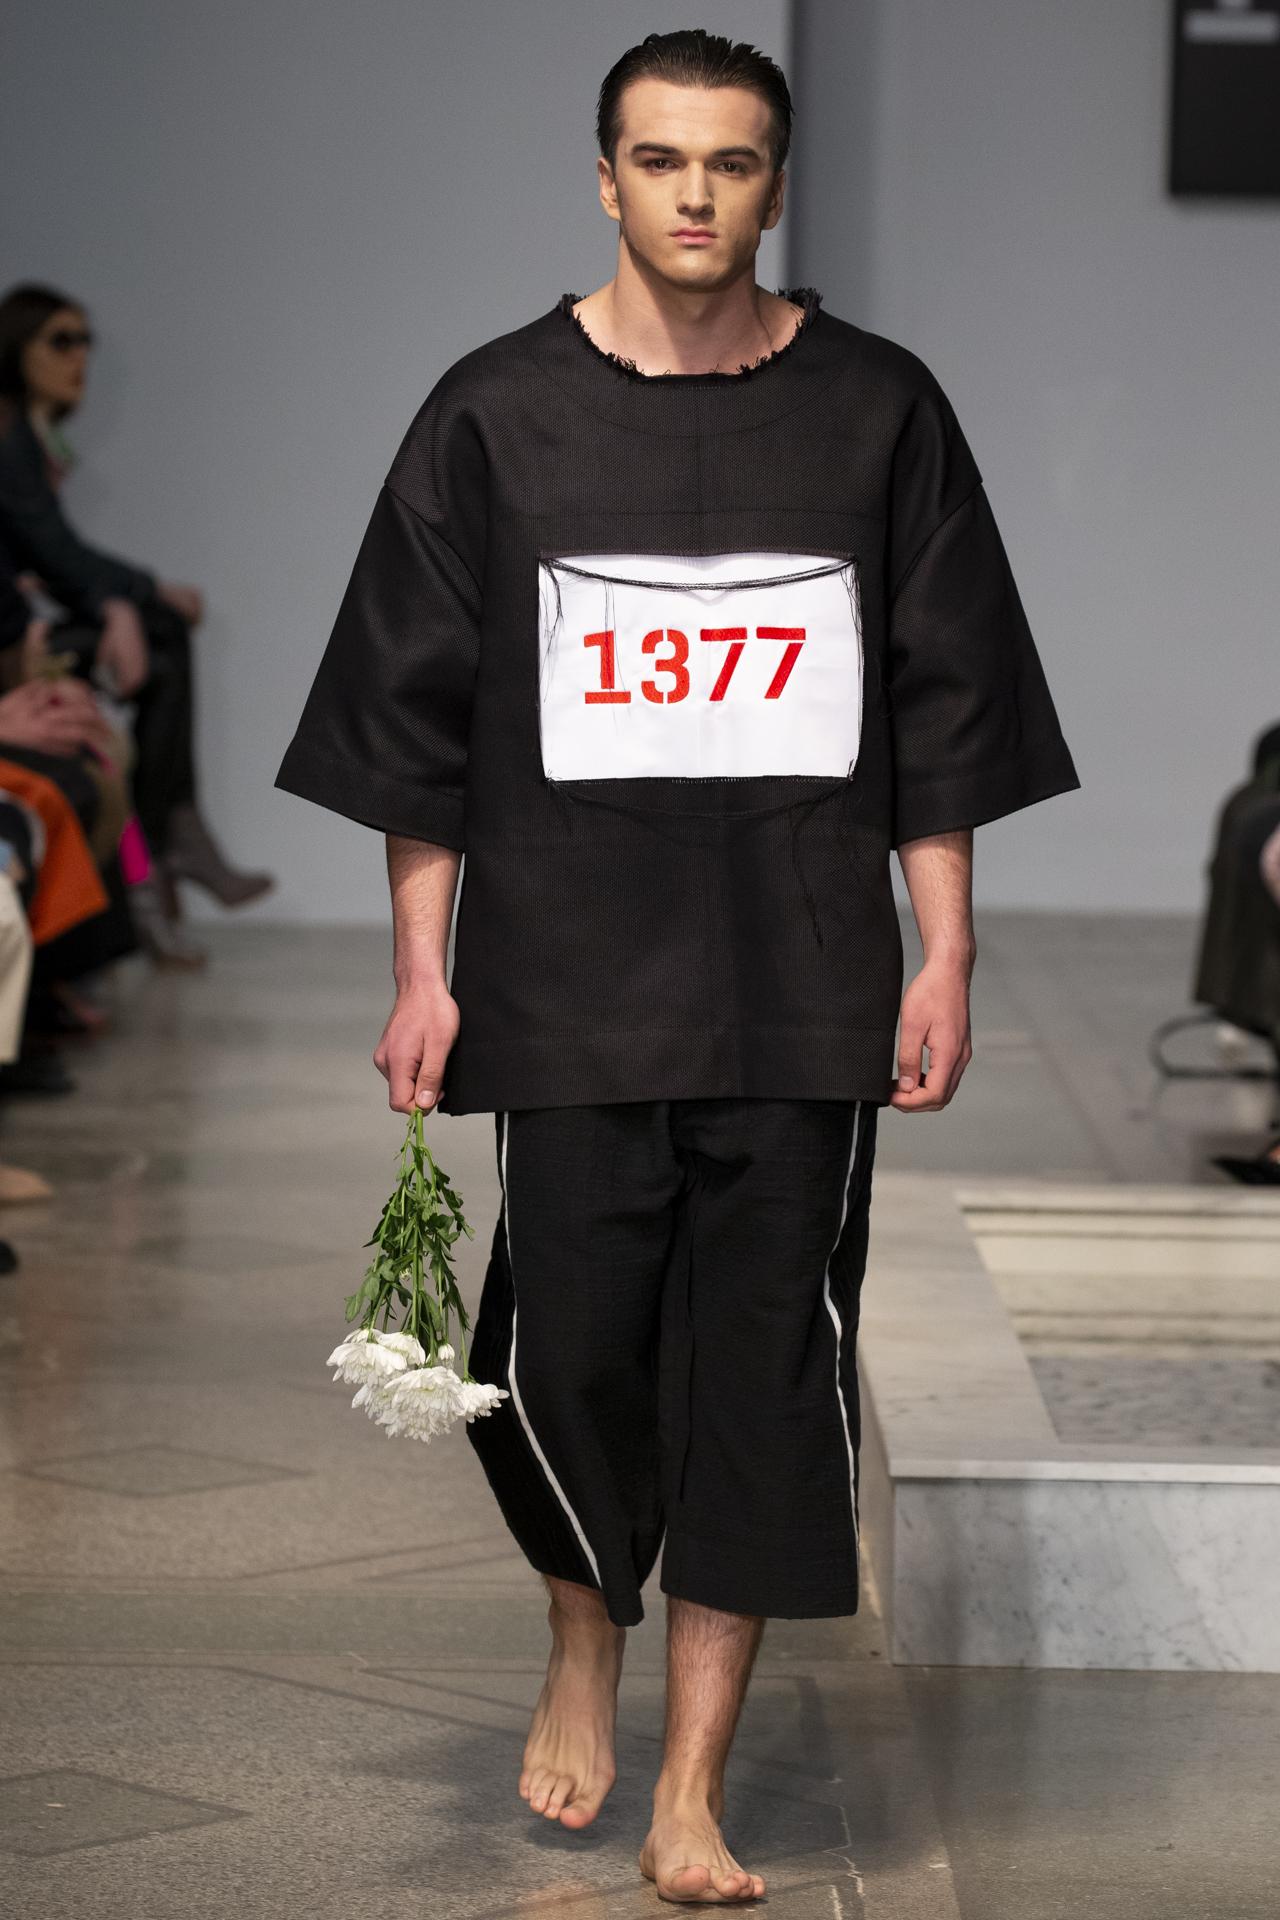 1377-Menswear_AW18_72dpi_009.jpg